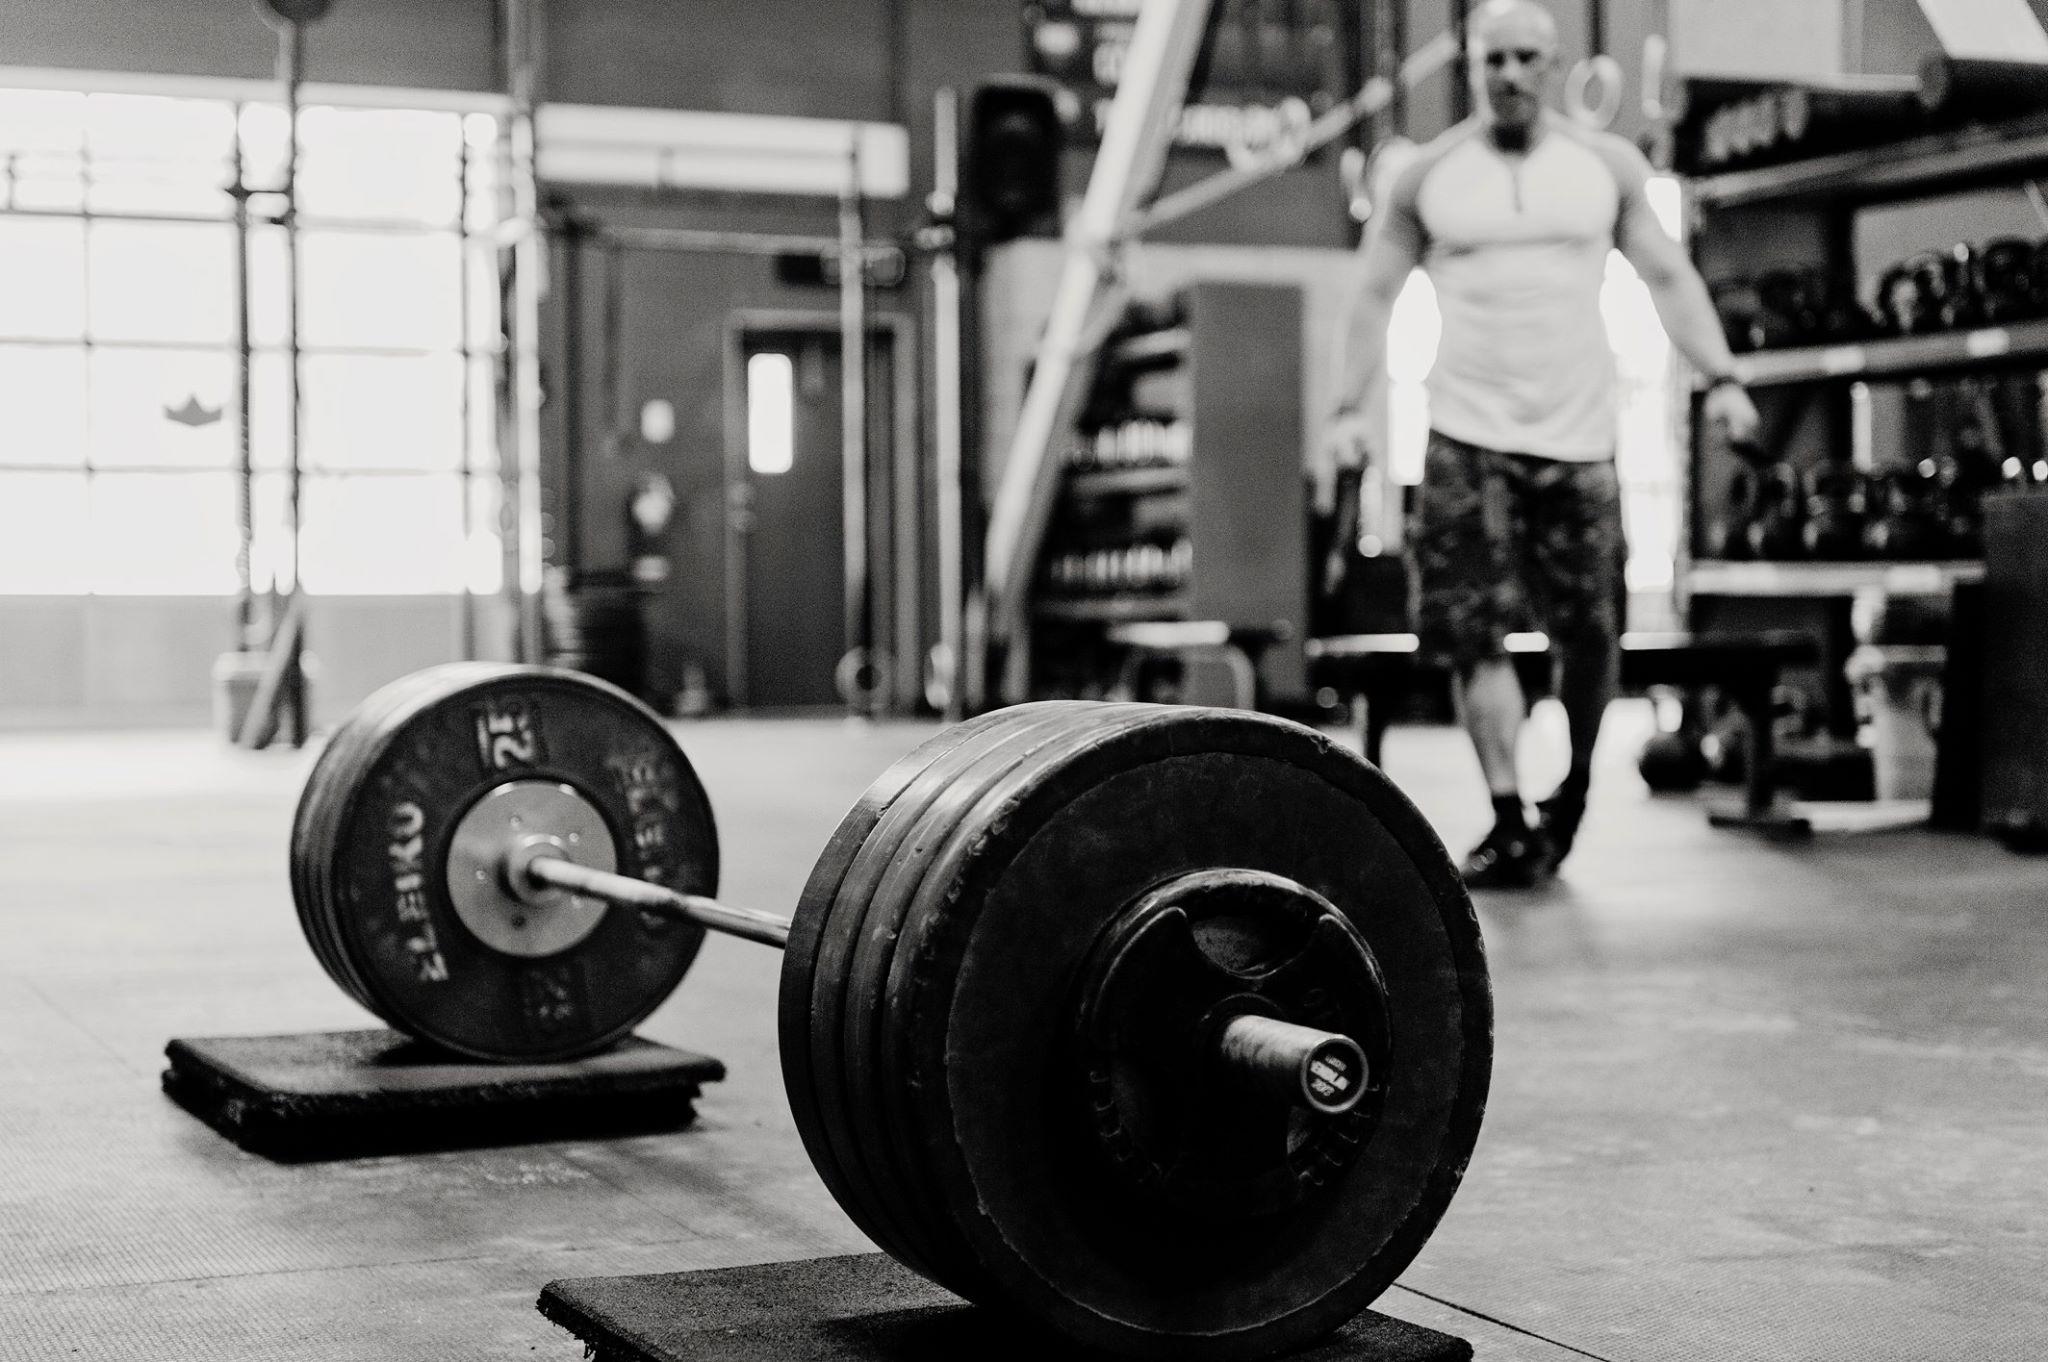 Percentage-Based Training Models: Problems